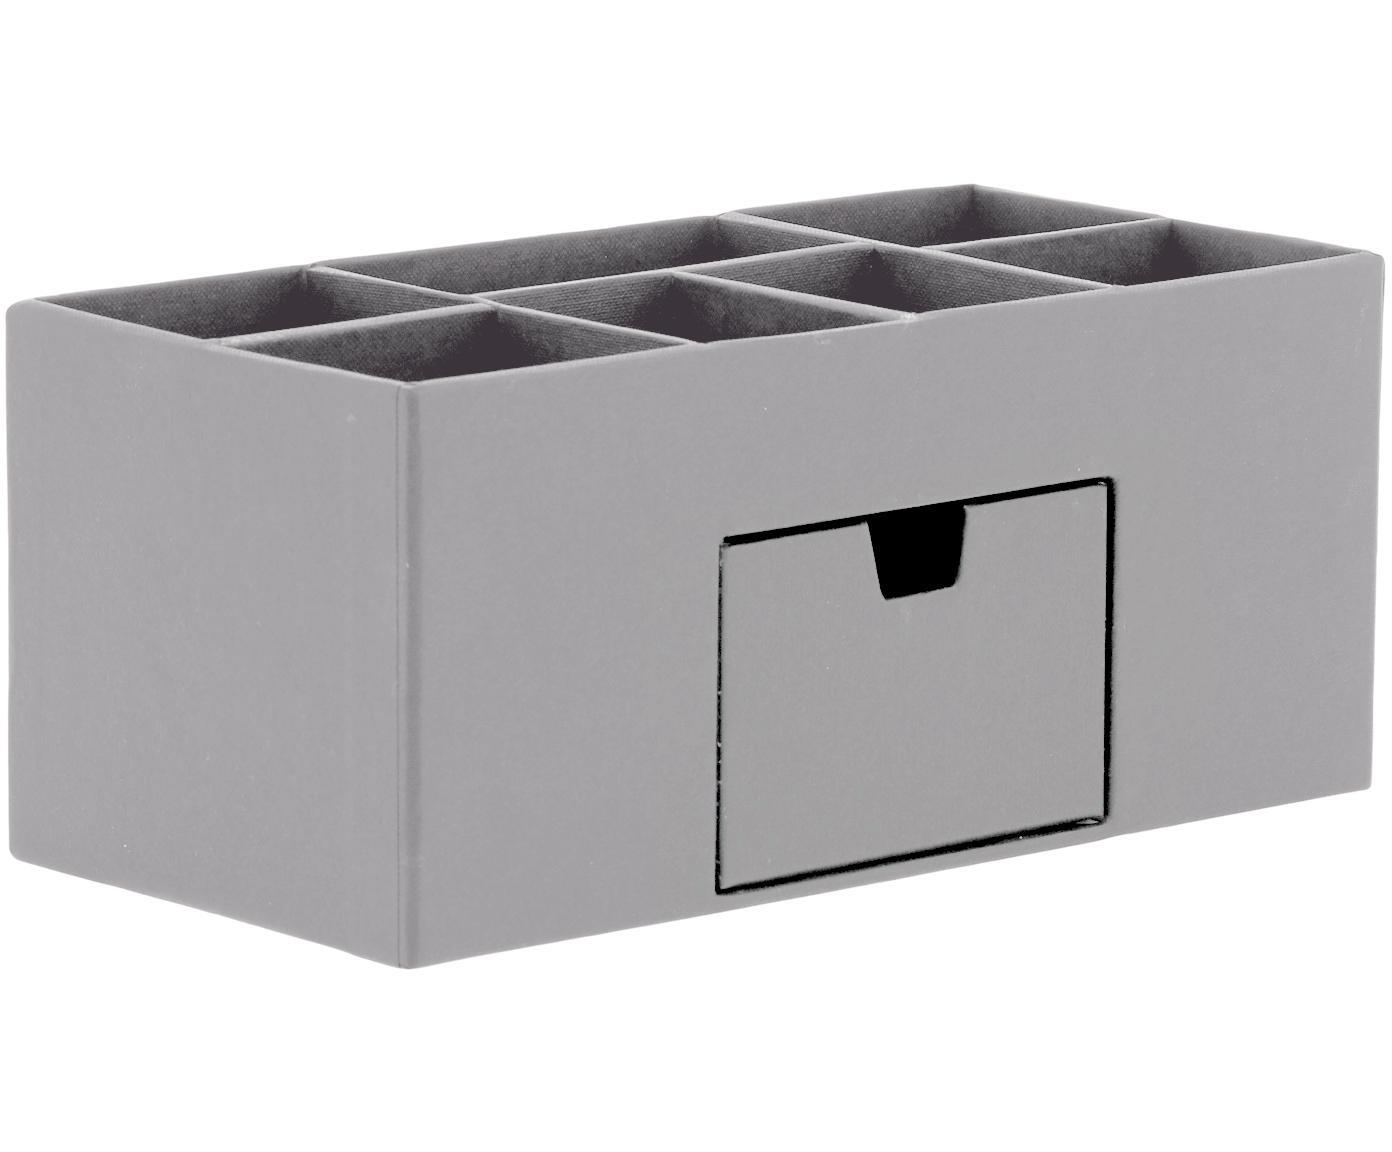 Büro-Organizer Vendela, Fester, laminierter Karton, Grau, 24 x 11 cm